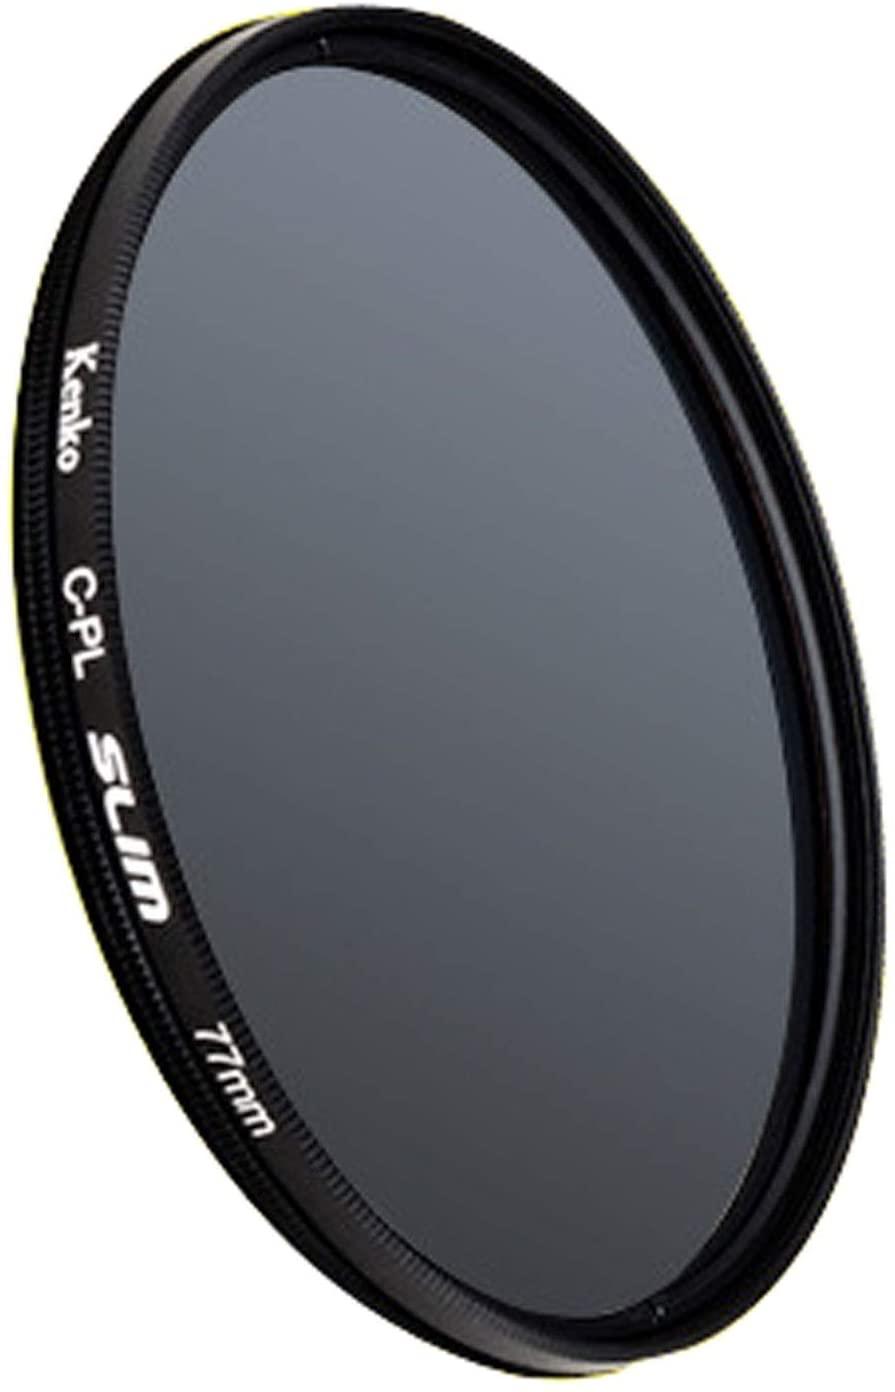 Wangclj Filter Lens Multi-Layer Coating Uv Mirror Anti-UV Ultra-Thin HD Rubber (Size : 82mm)